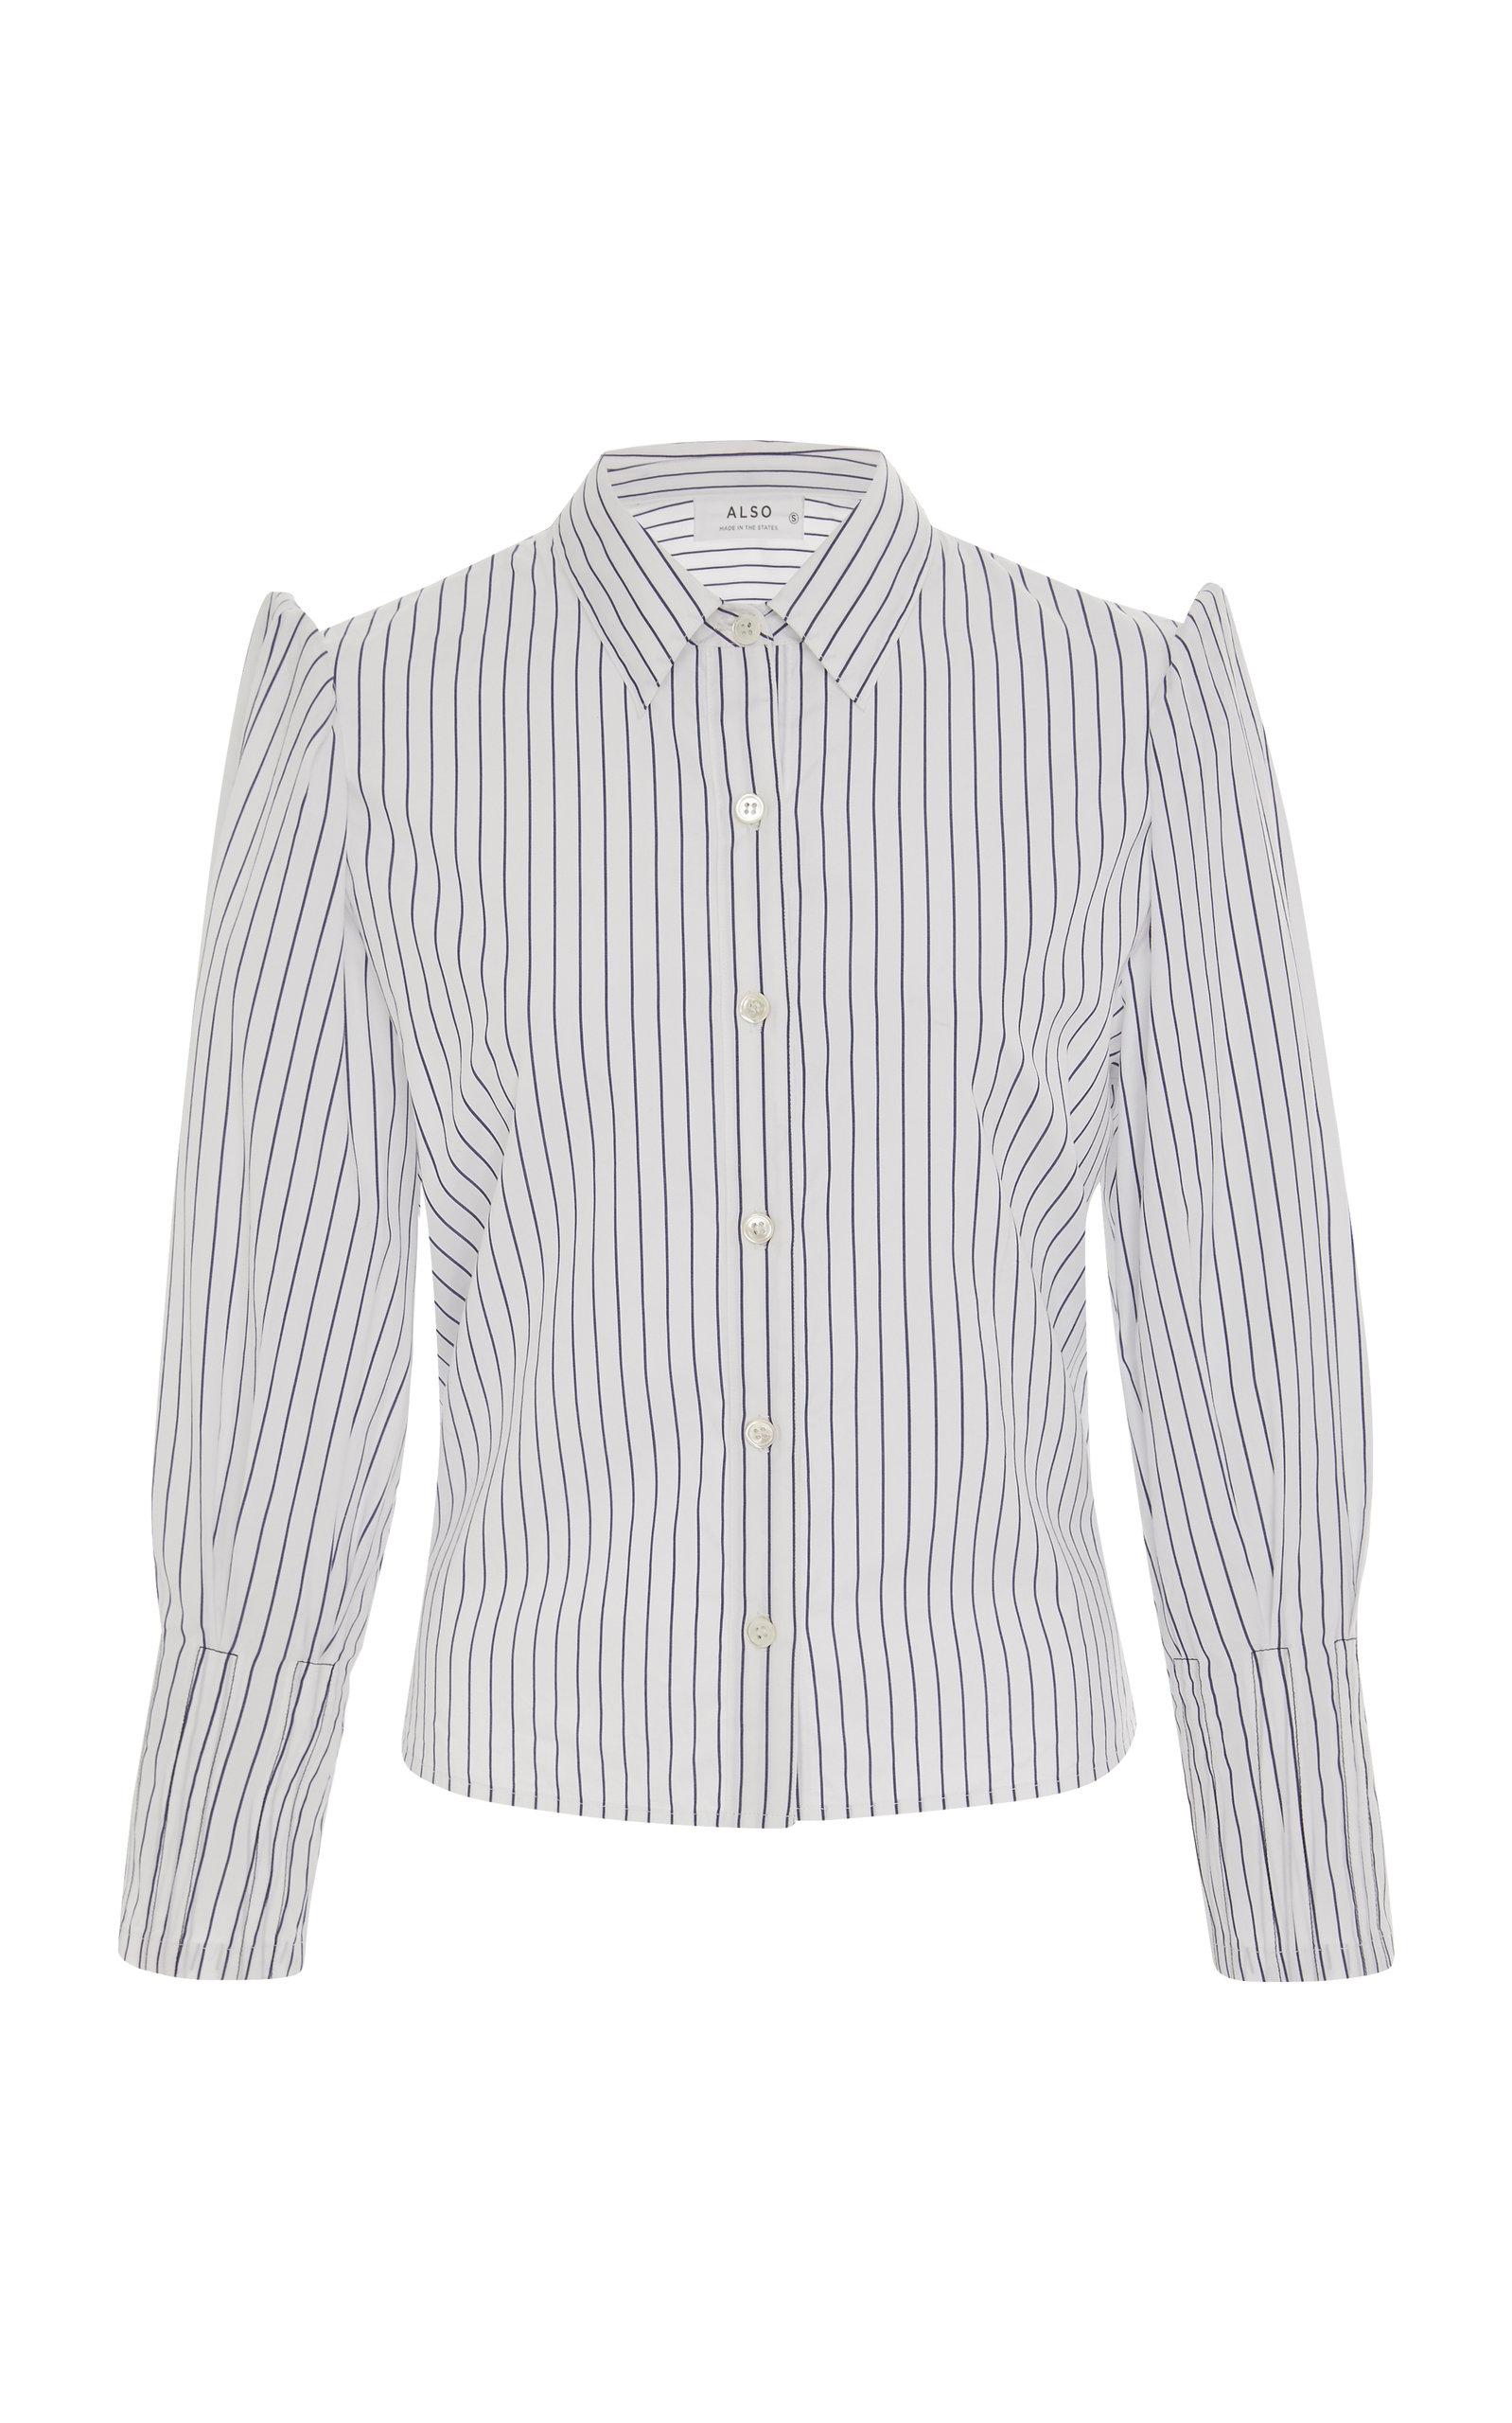 ALSO Striped Cotton Button-Up Shirt